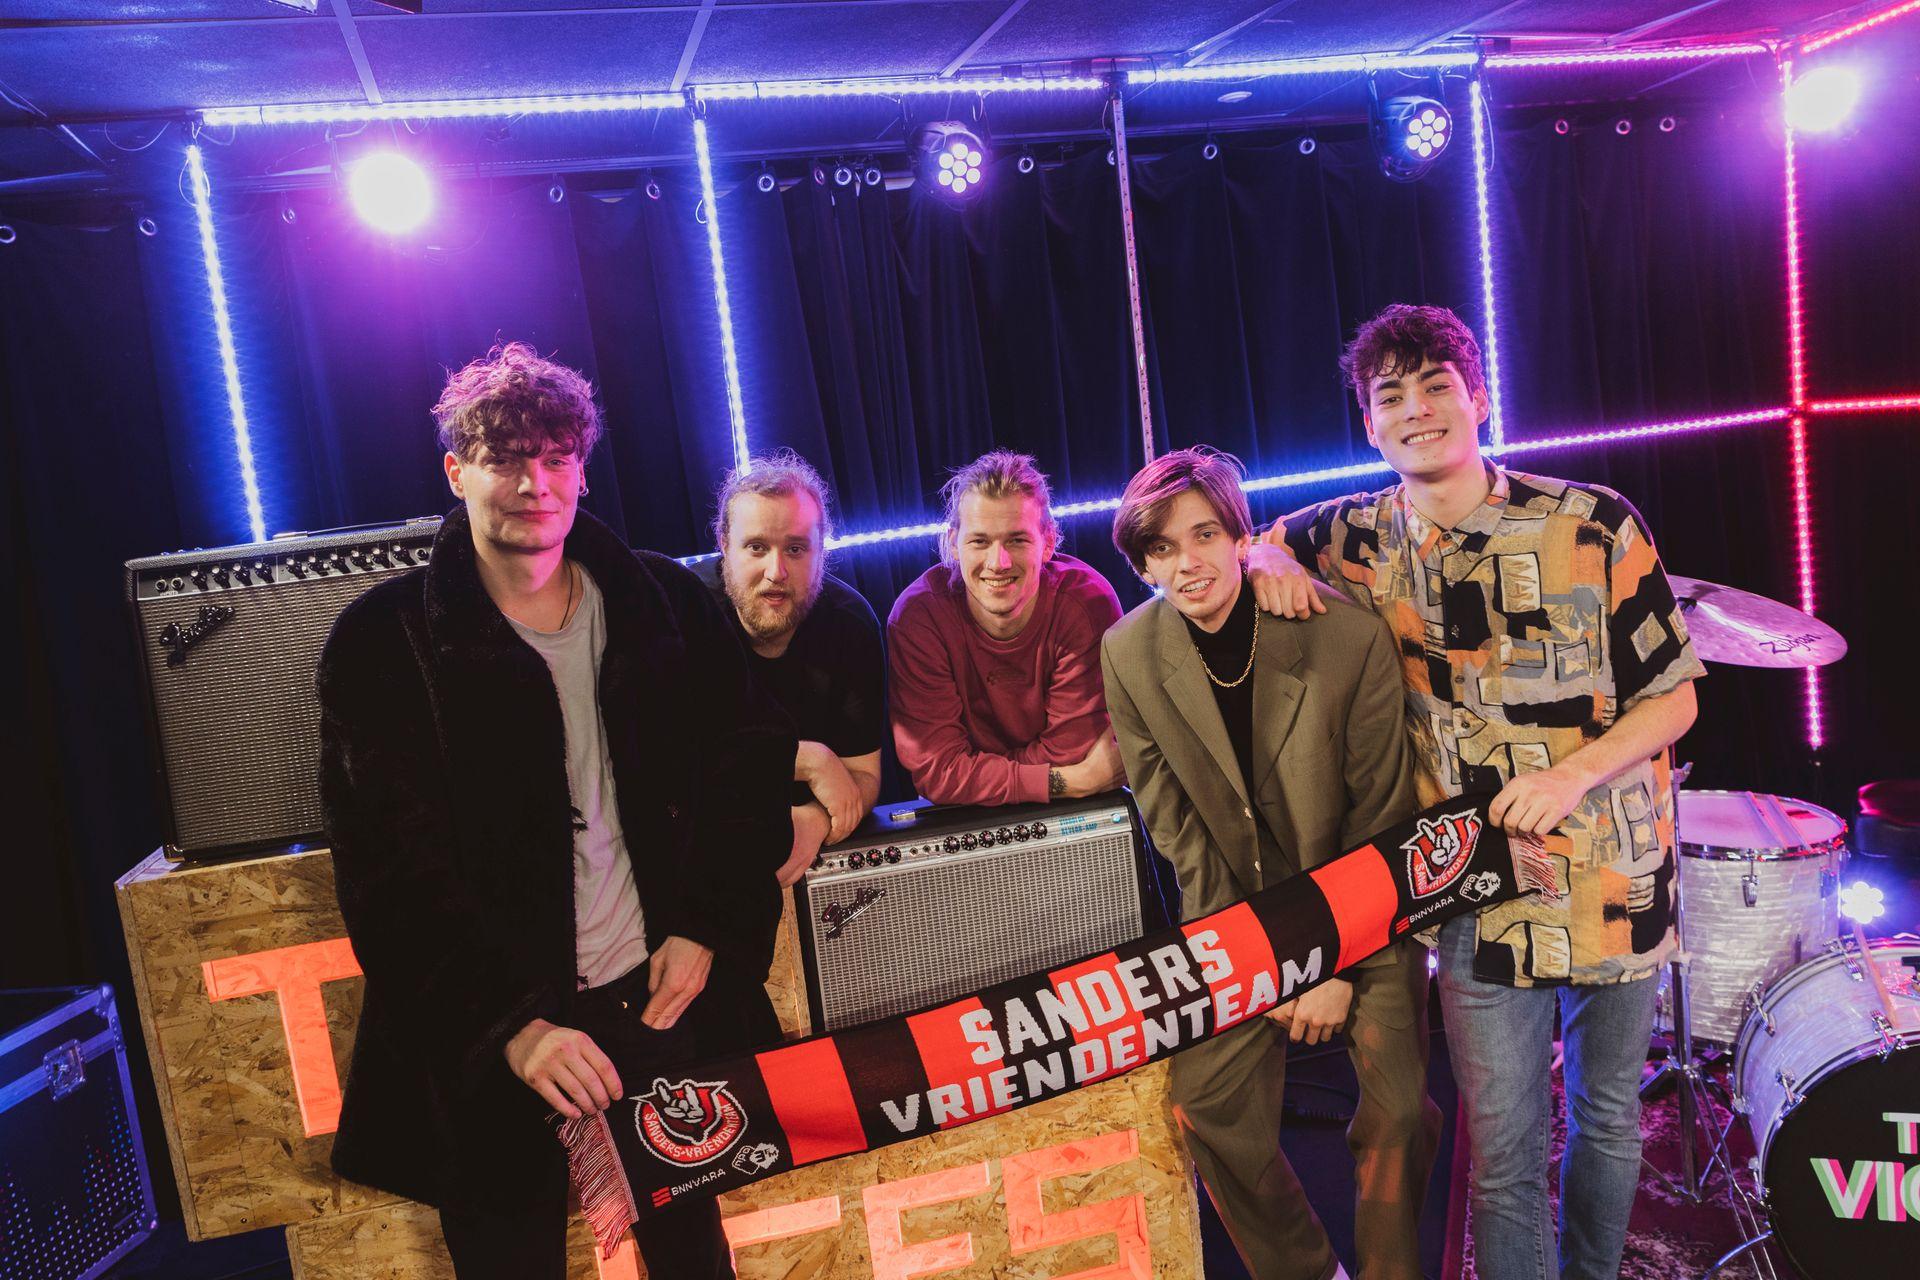 Gloednieuw 3FM Talent The Vices speelt 'Boy'